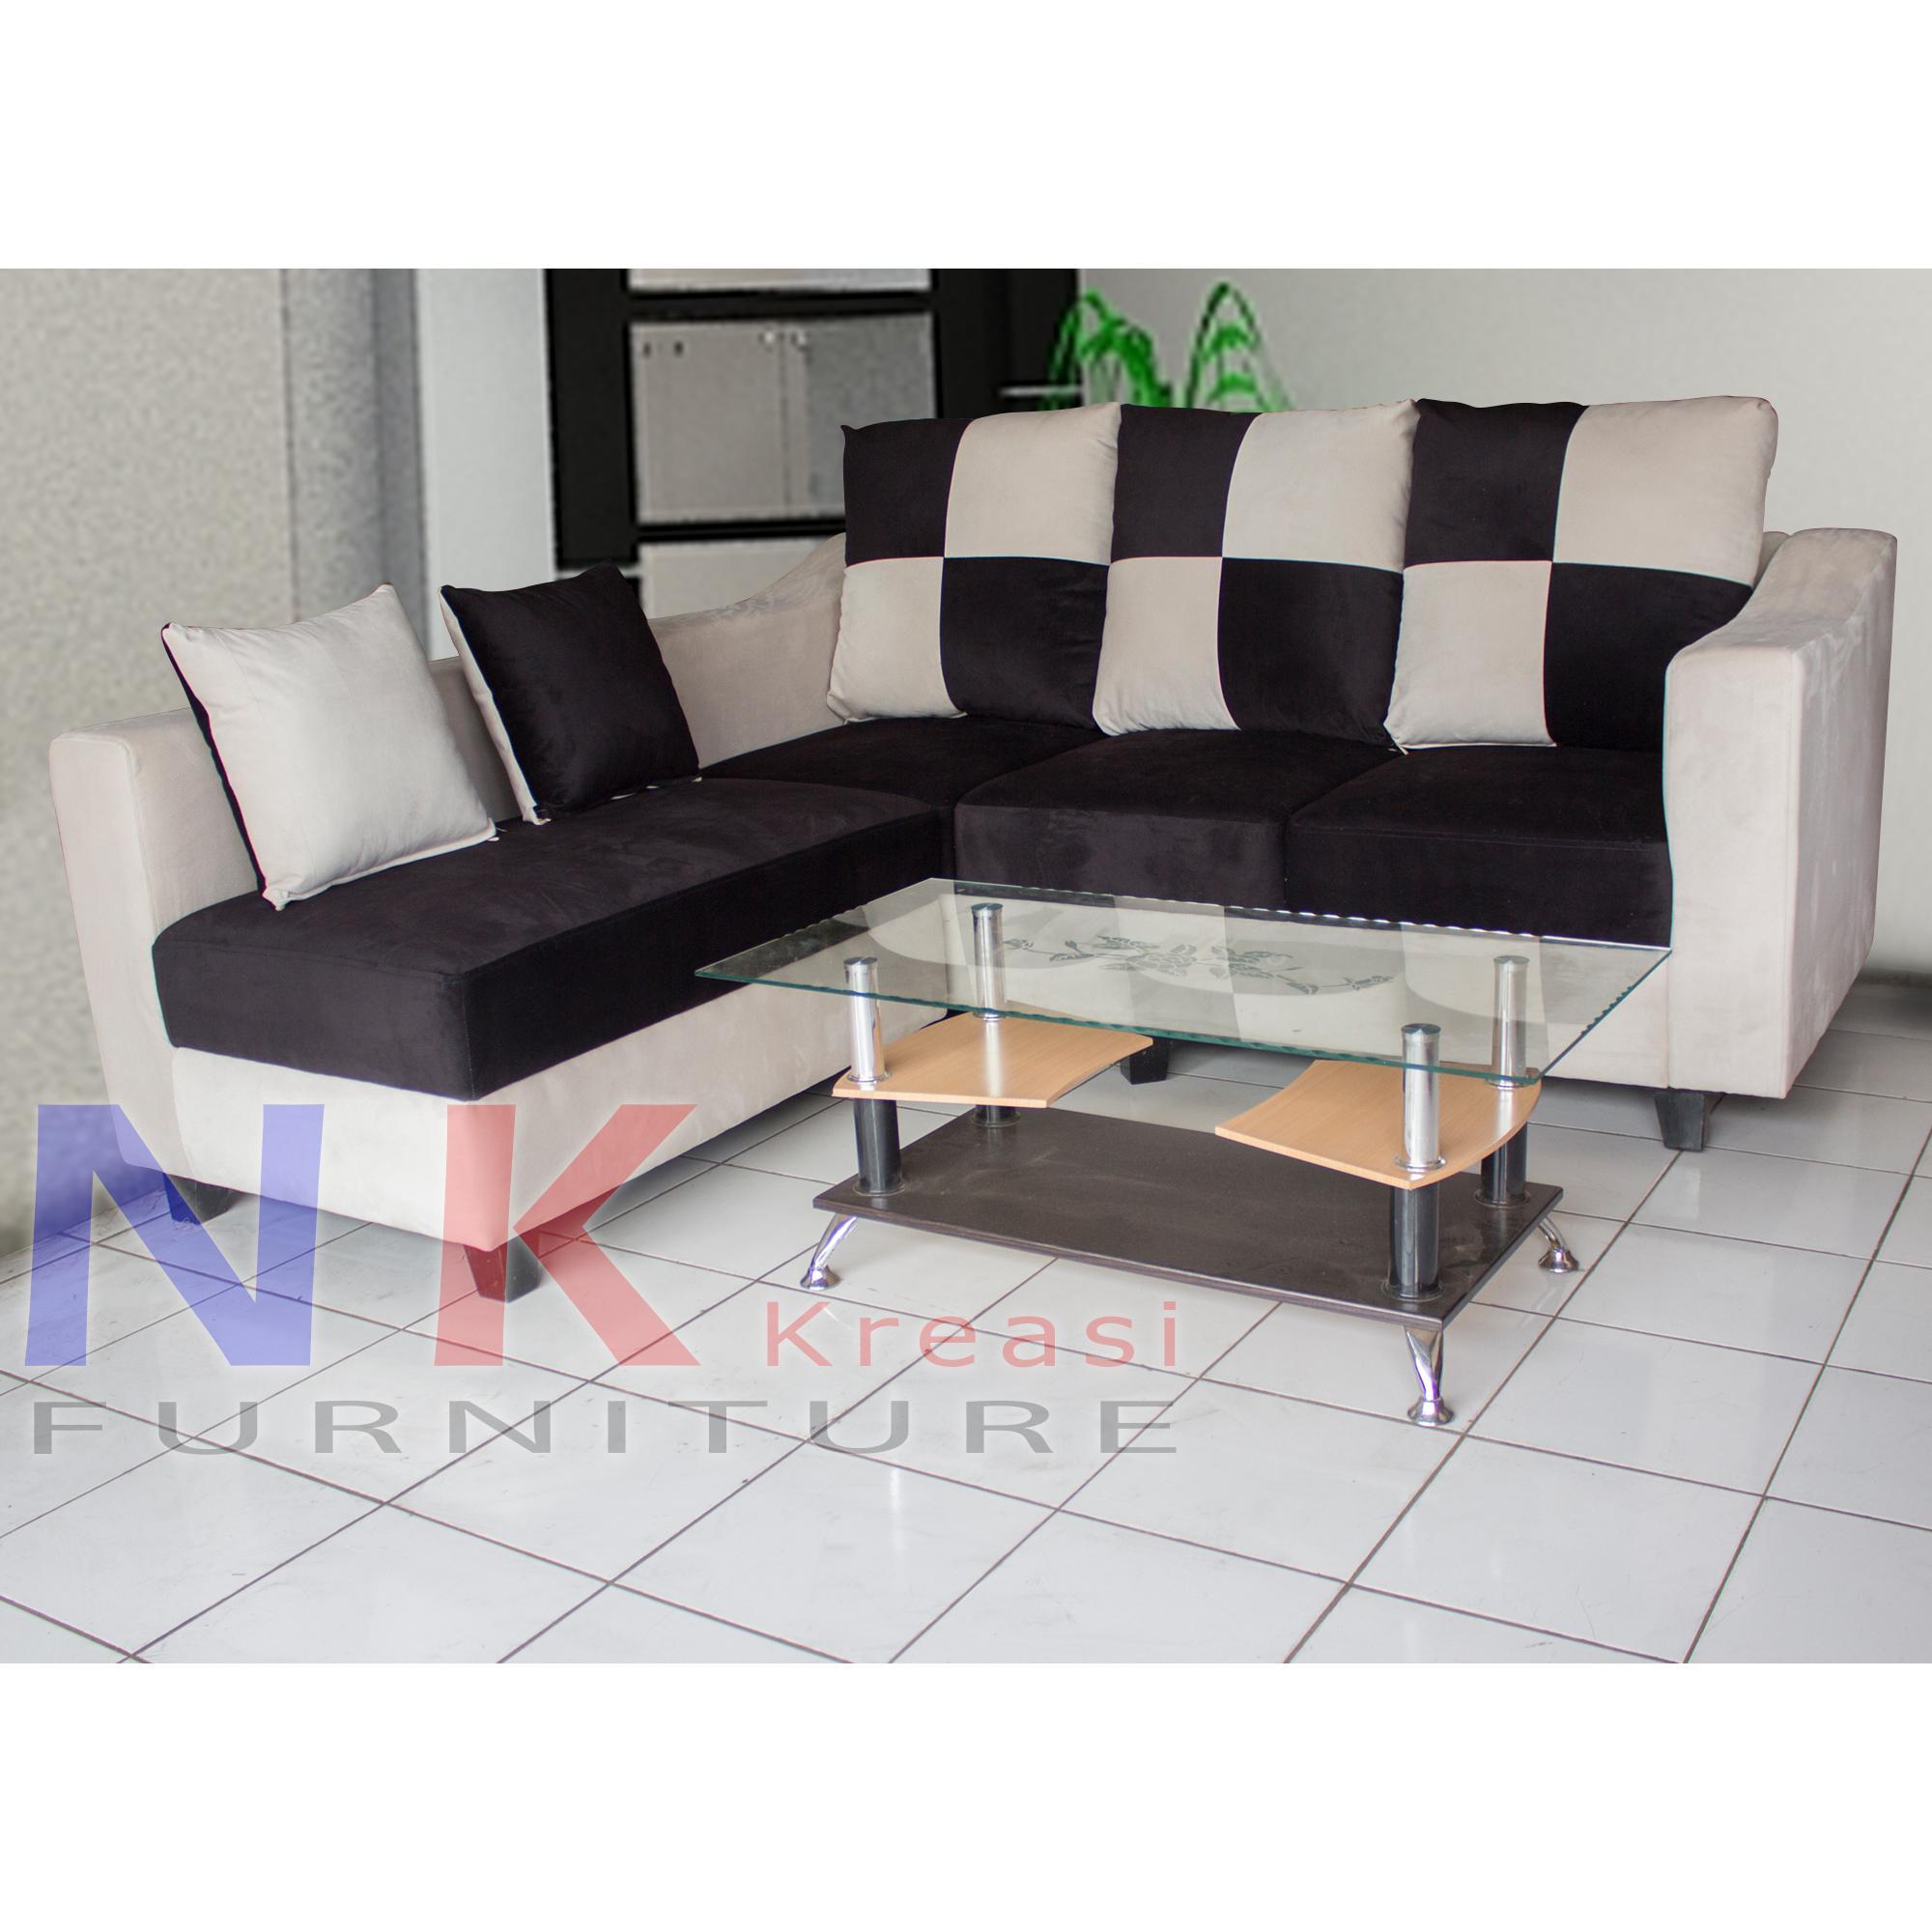 Sofa Kursi Tamu minimalis, sofa sudut catur mewah + MEJA TAMU - JABODETABEK ONLY